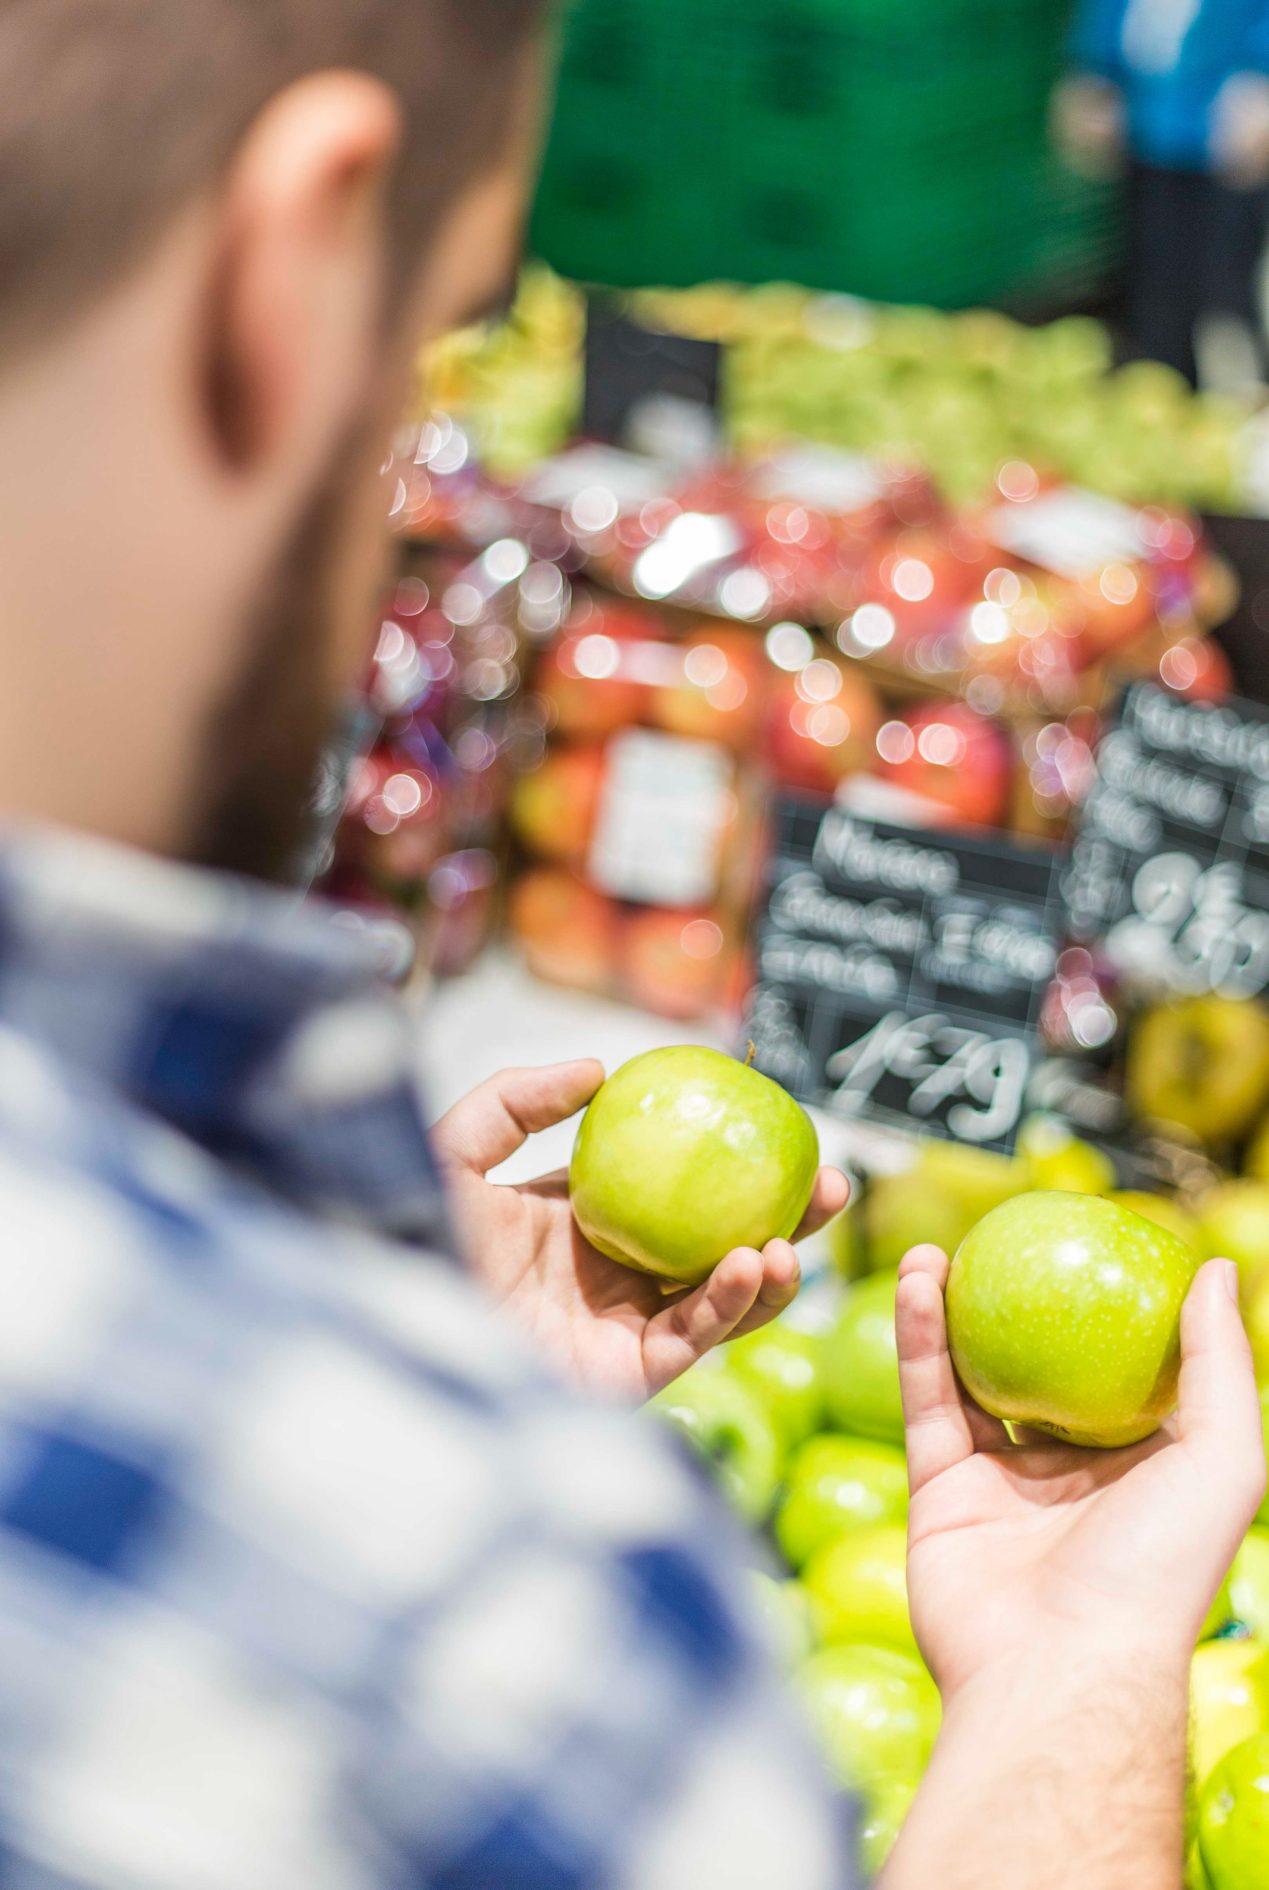 Hort fruti na quarentena